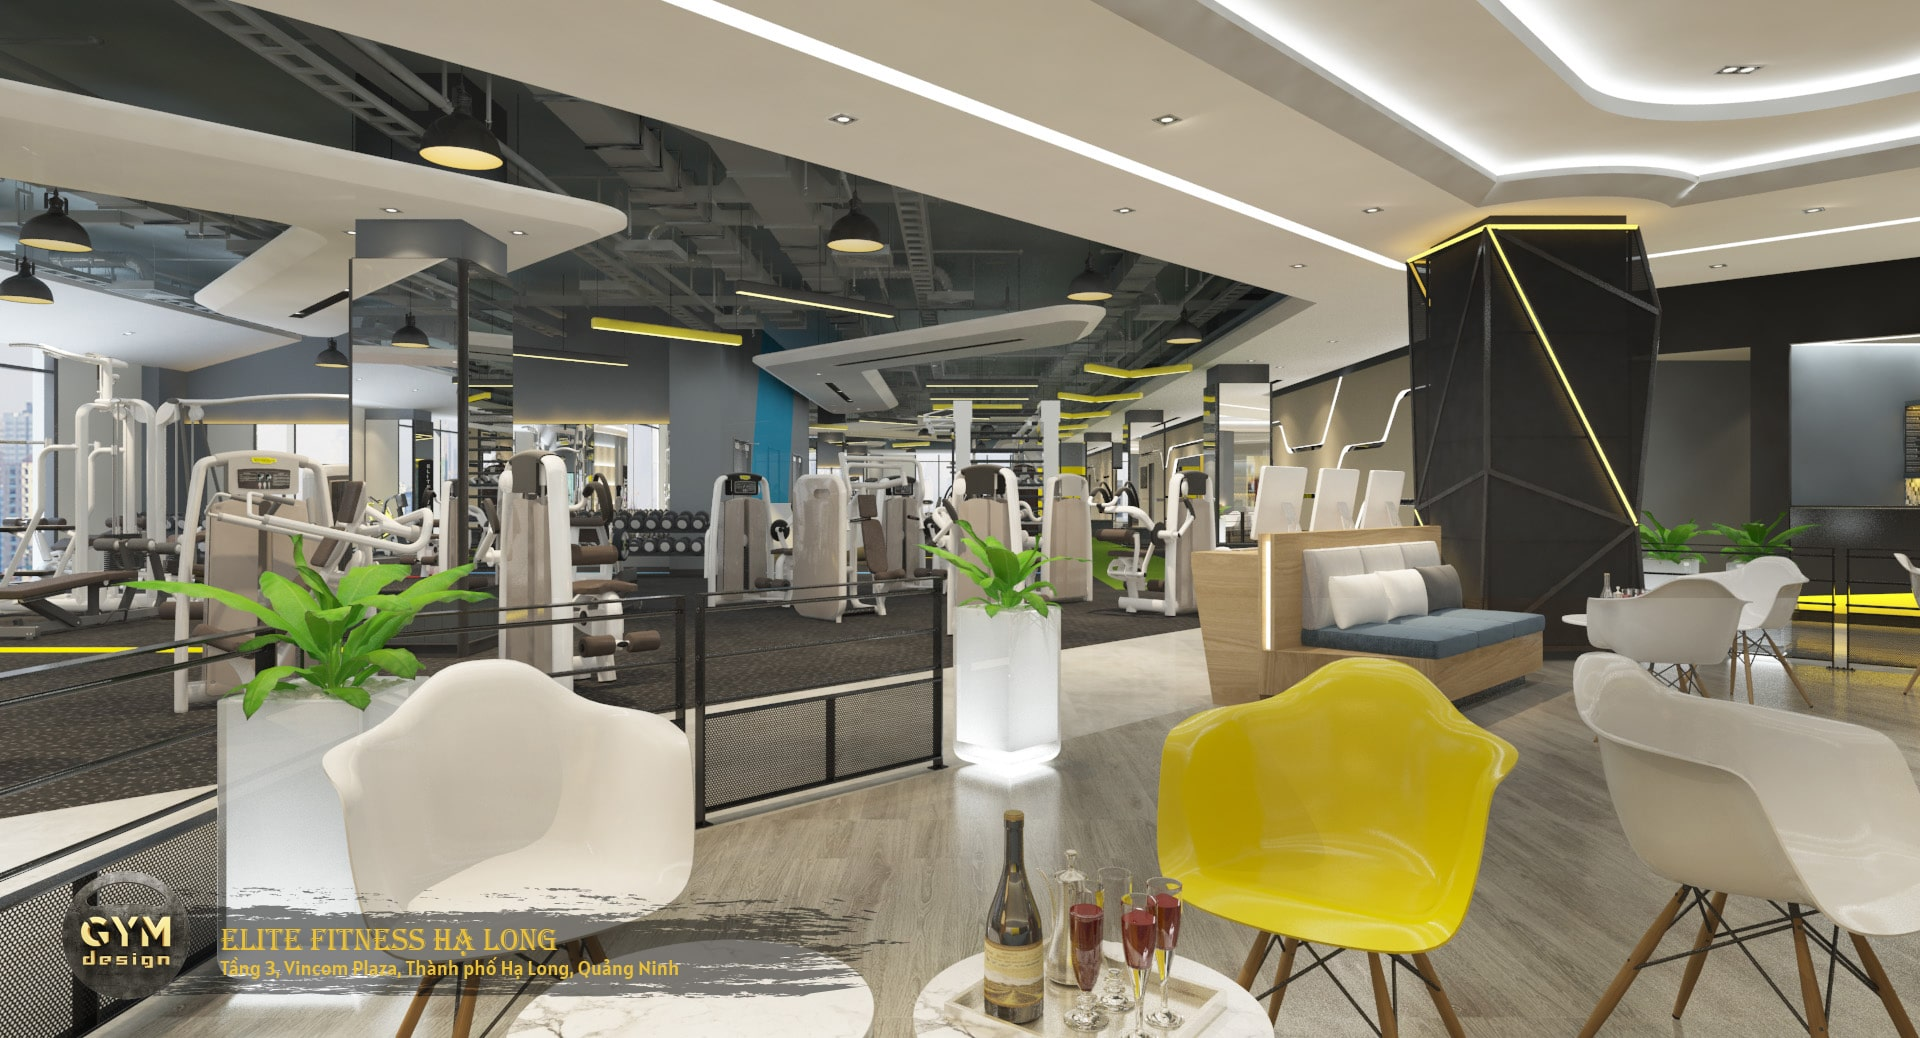 thiet-ke-phong-gym-elite-fitness-ha-long-16